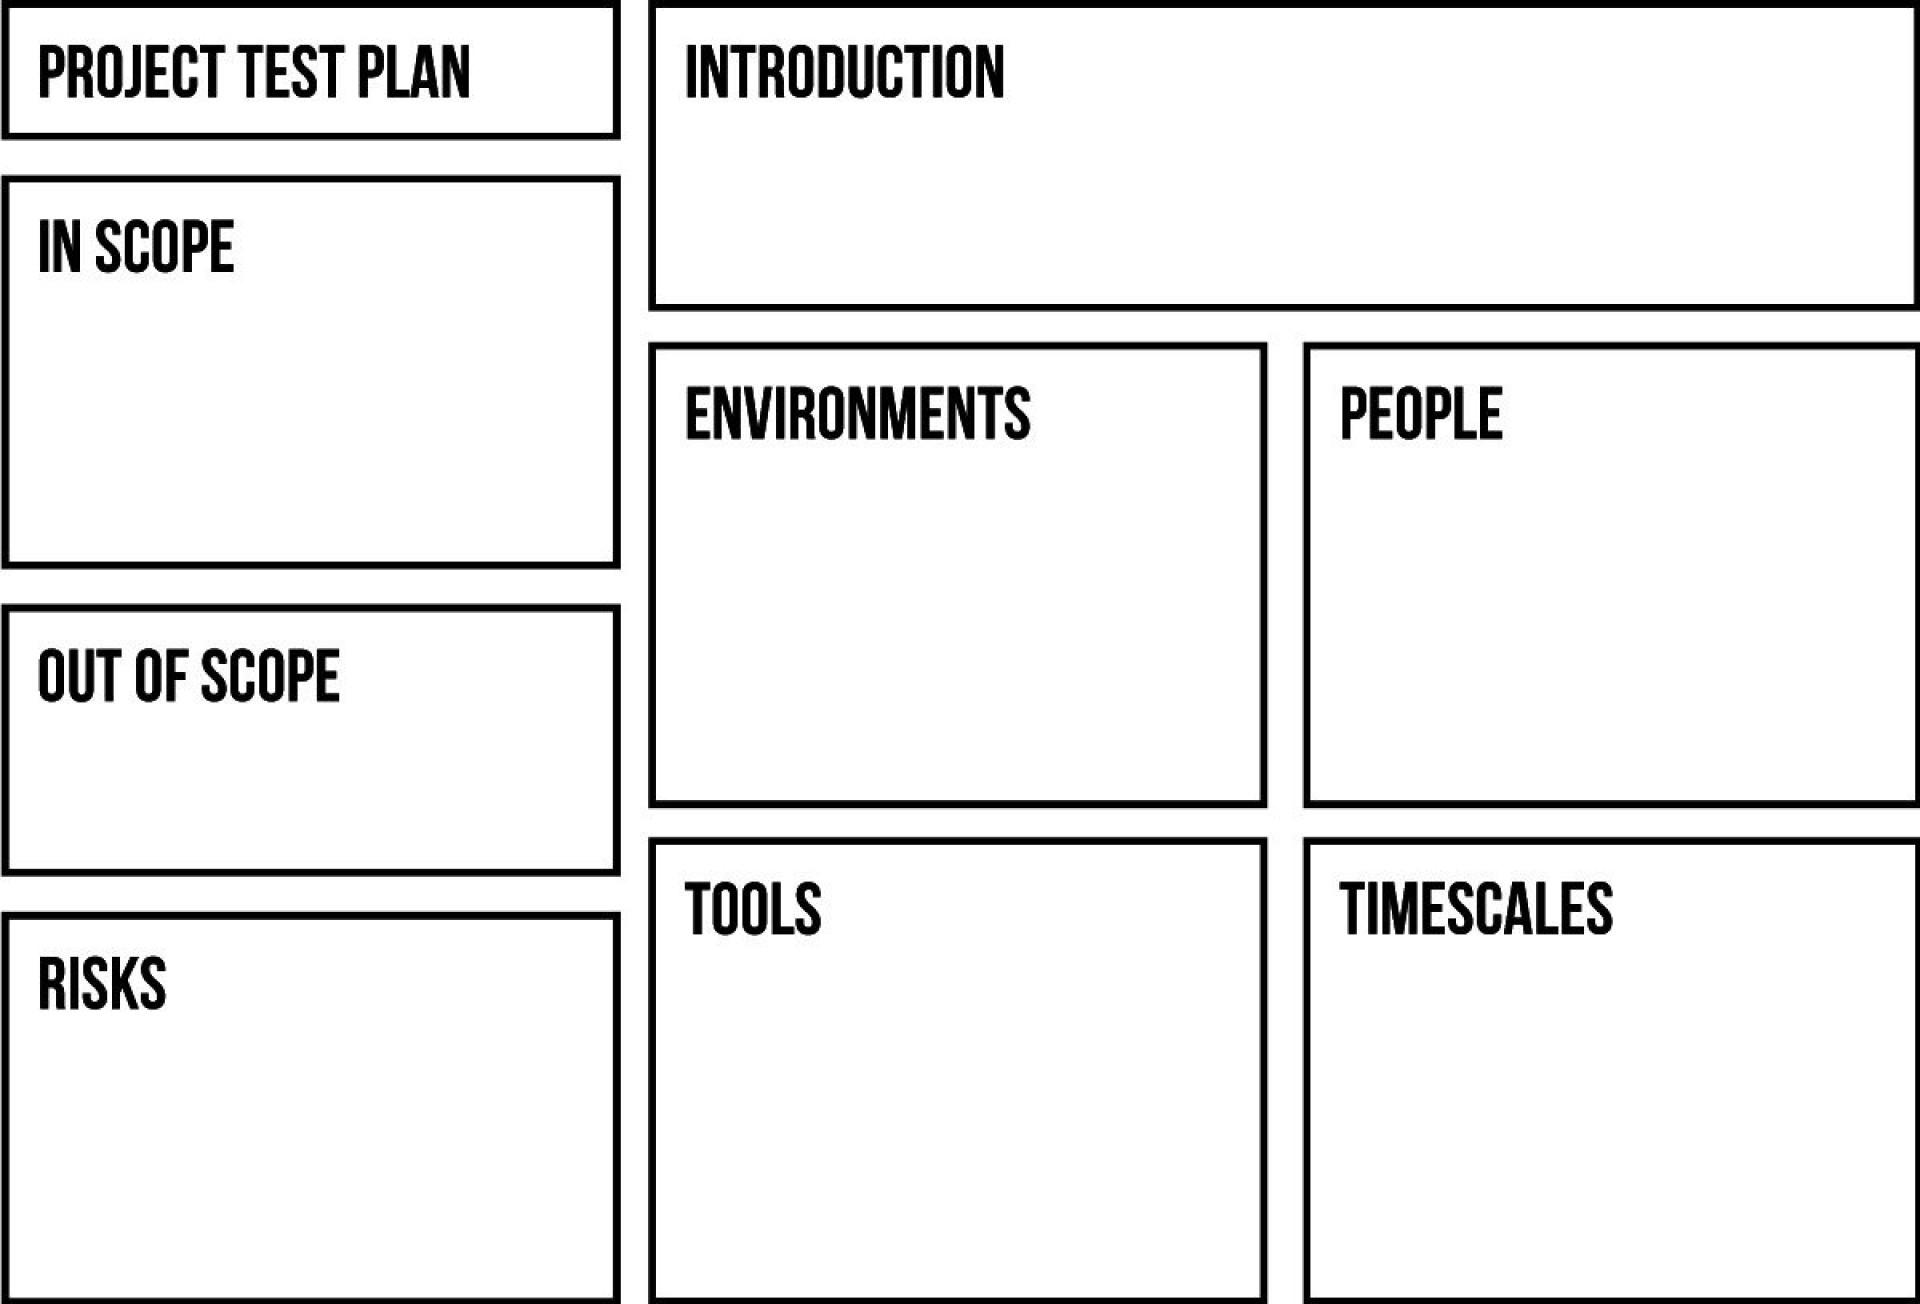 003 Phenomenal Simple Test Plan Template Design  Software Uat1920